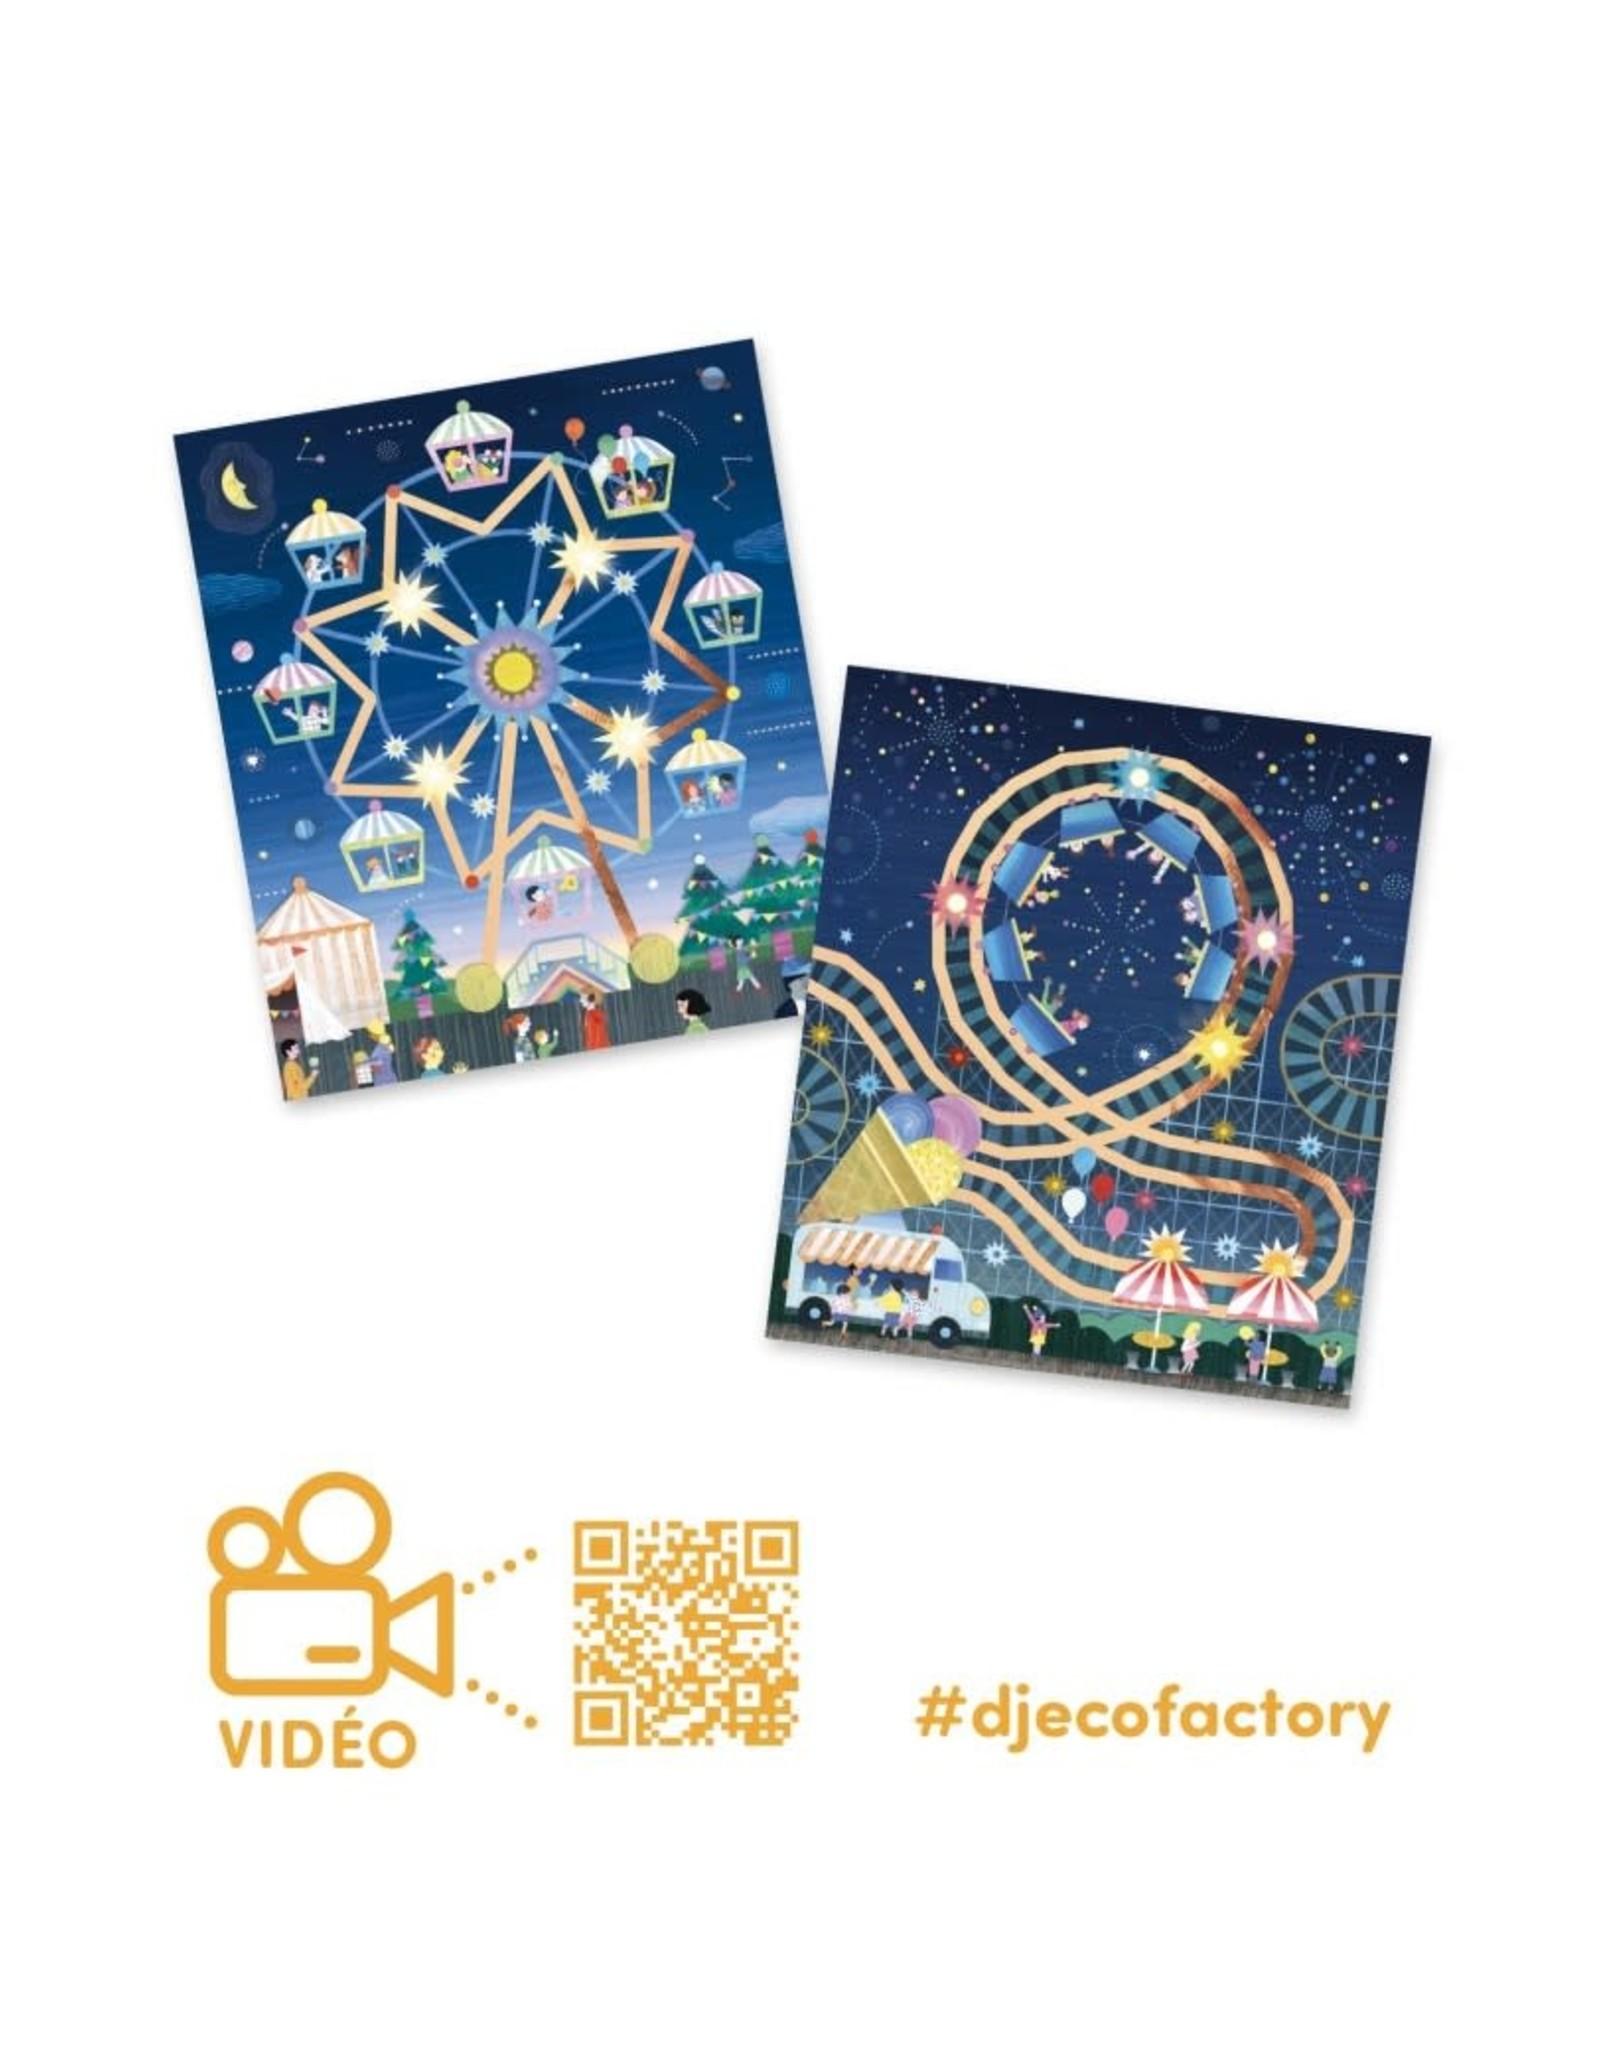 Djeco Factory Art+Technology Hoog in de lucht